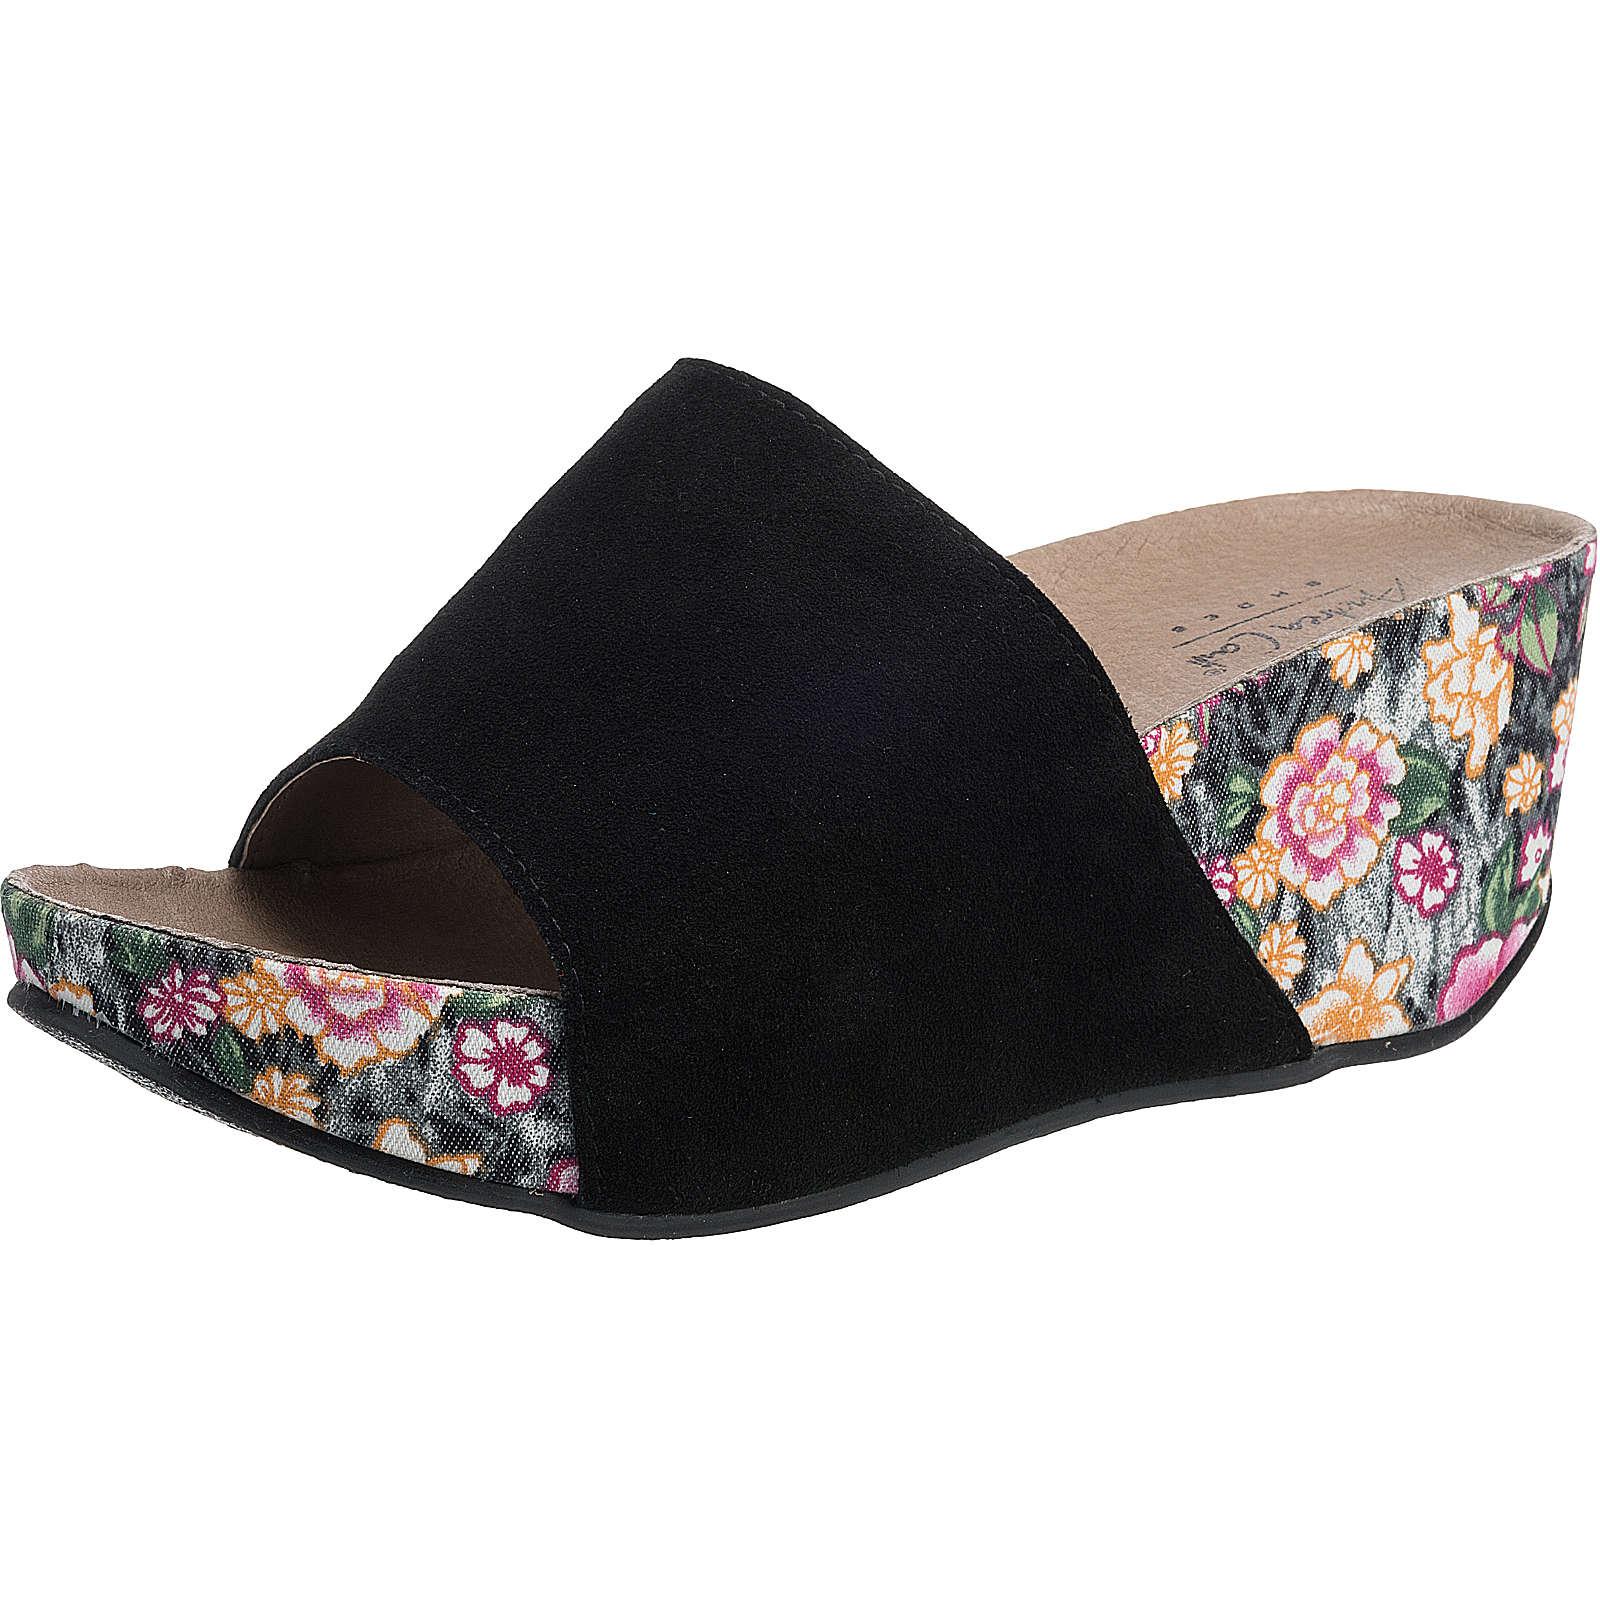 Andrea Conti Pantoletten schwarz Damen Gr. 36 jetztbilligerkaufen